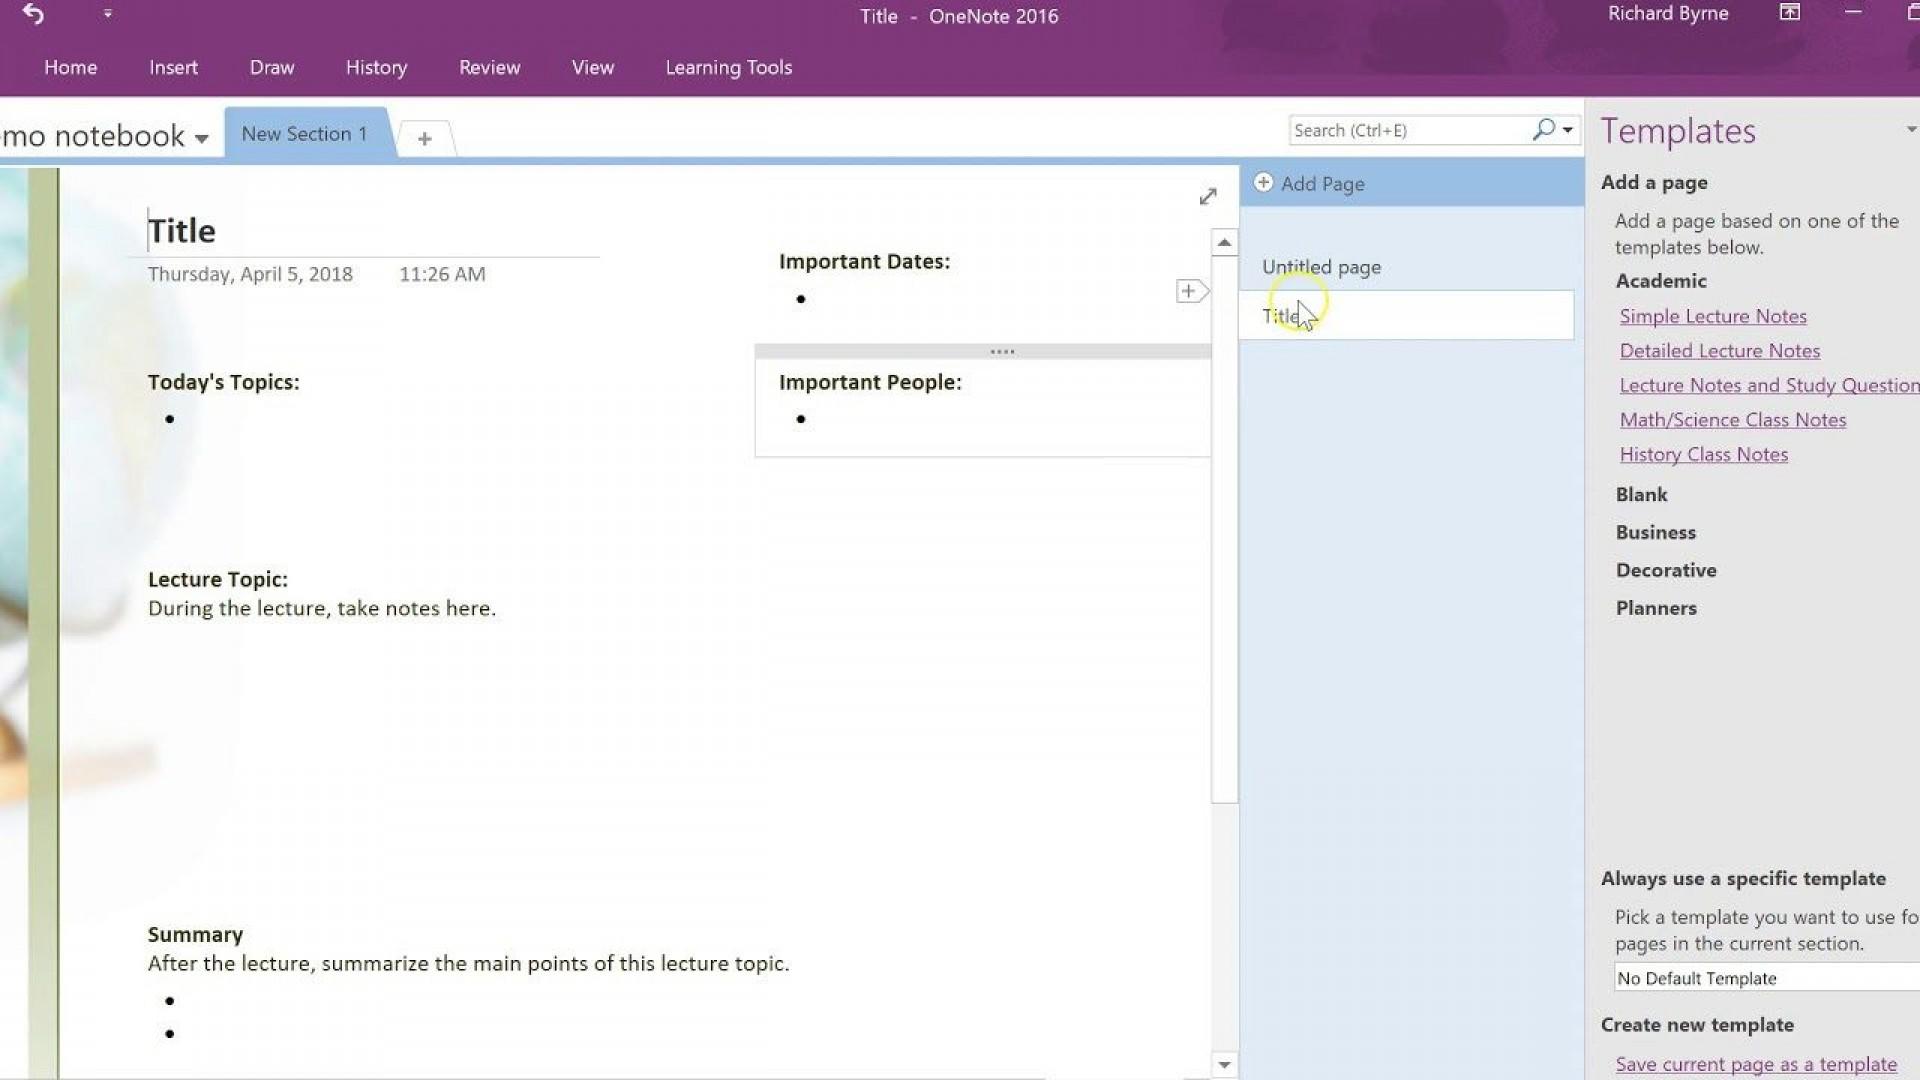 009 Impressive Microsoft Onenote Project Management Template Idea 1920